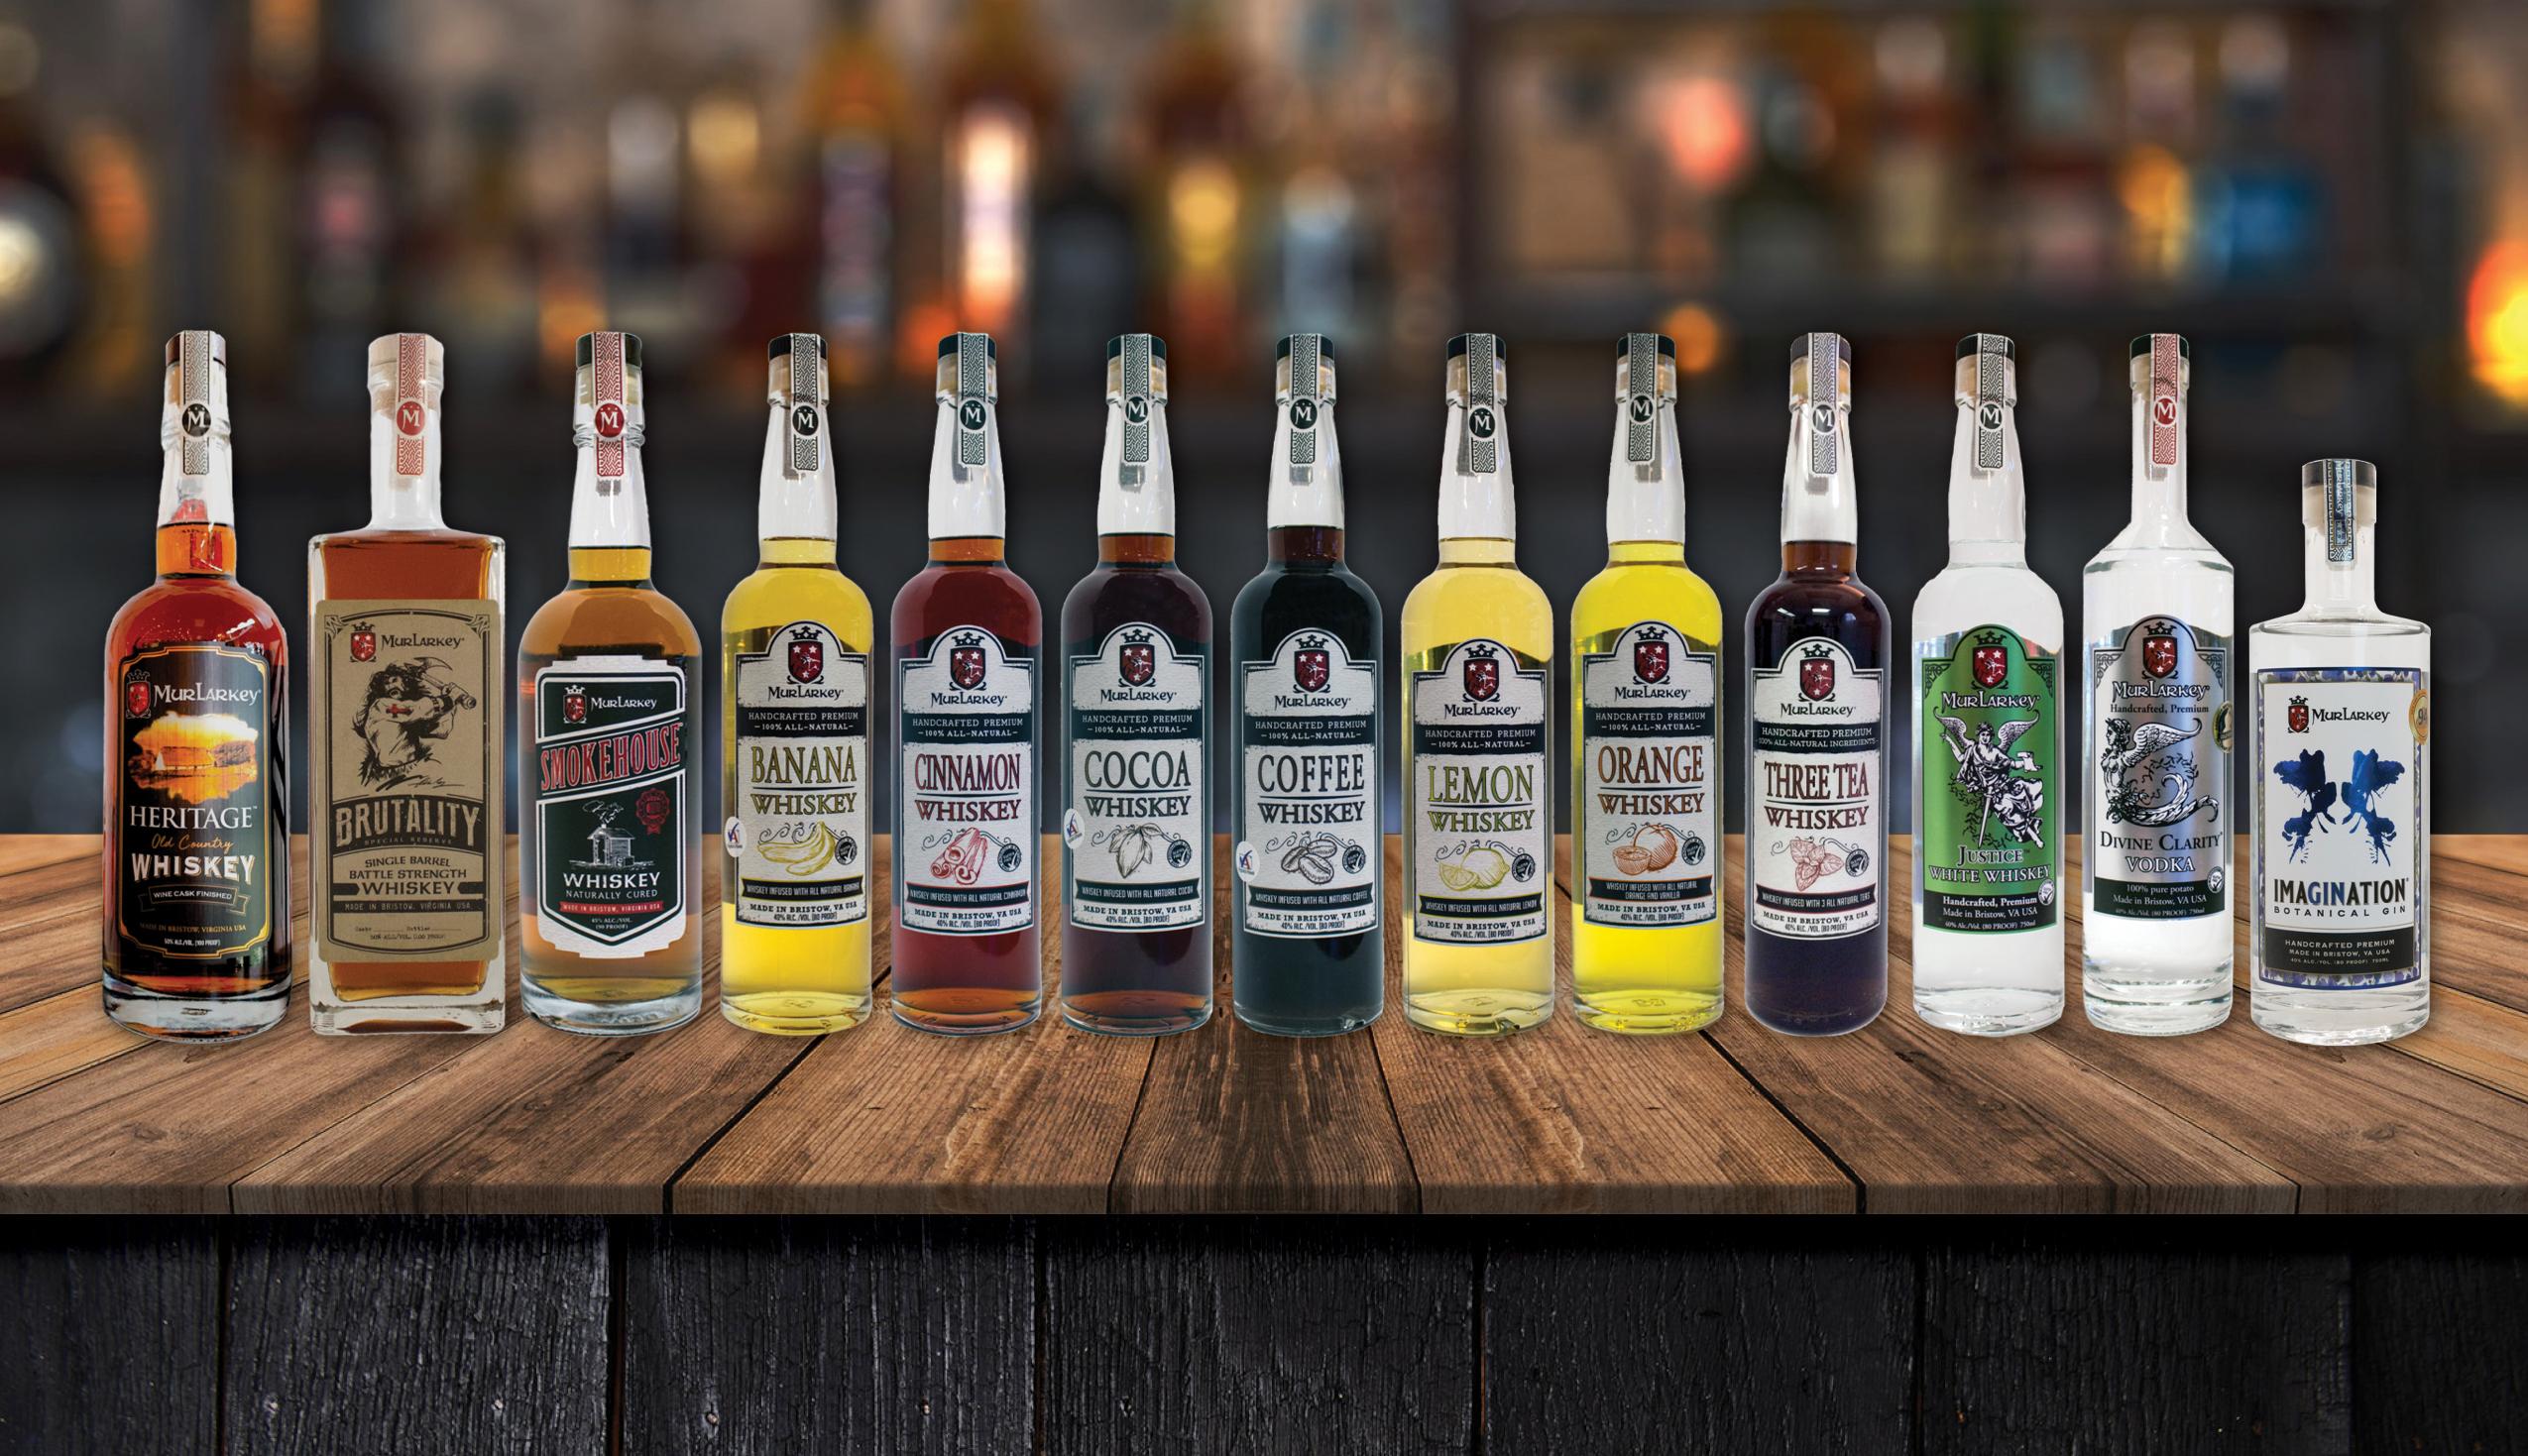 https://murlarkey.com/wp-content/uploads/2021/04/MurLarkey-Bottles.jpg